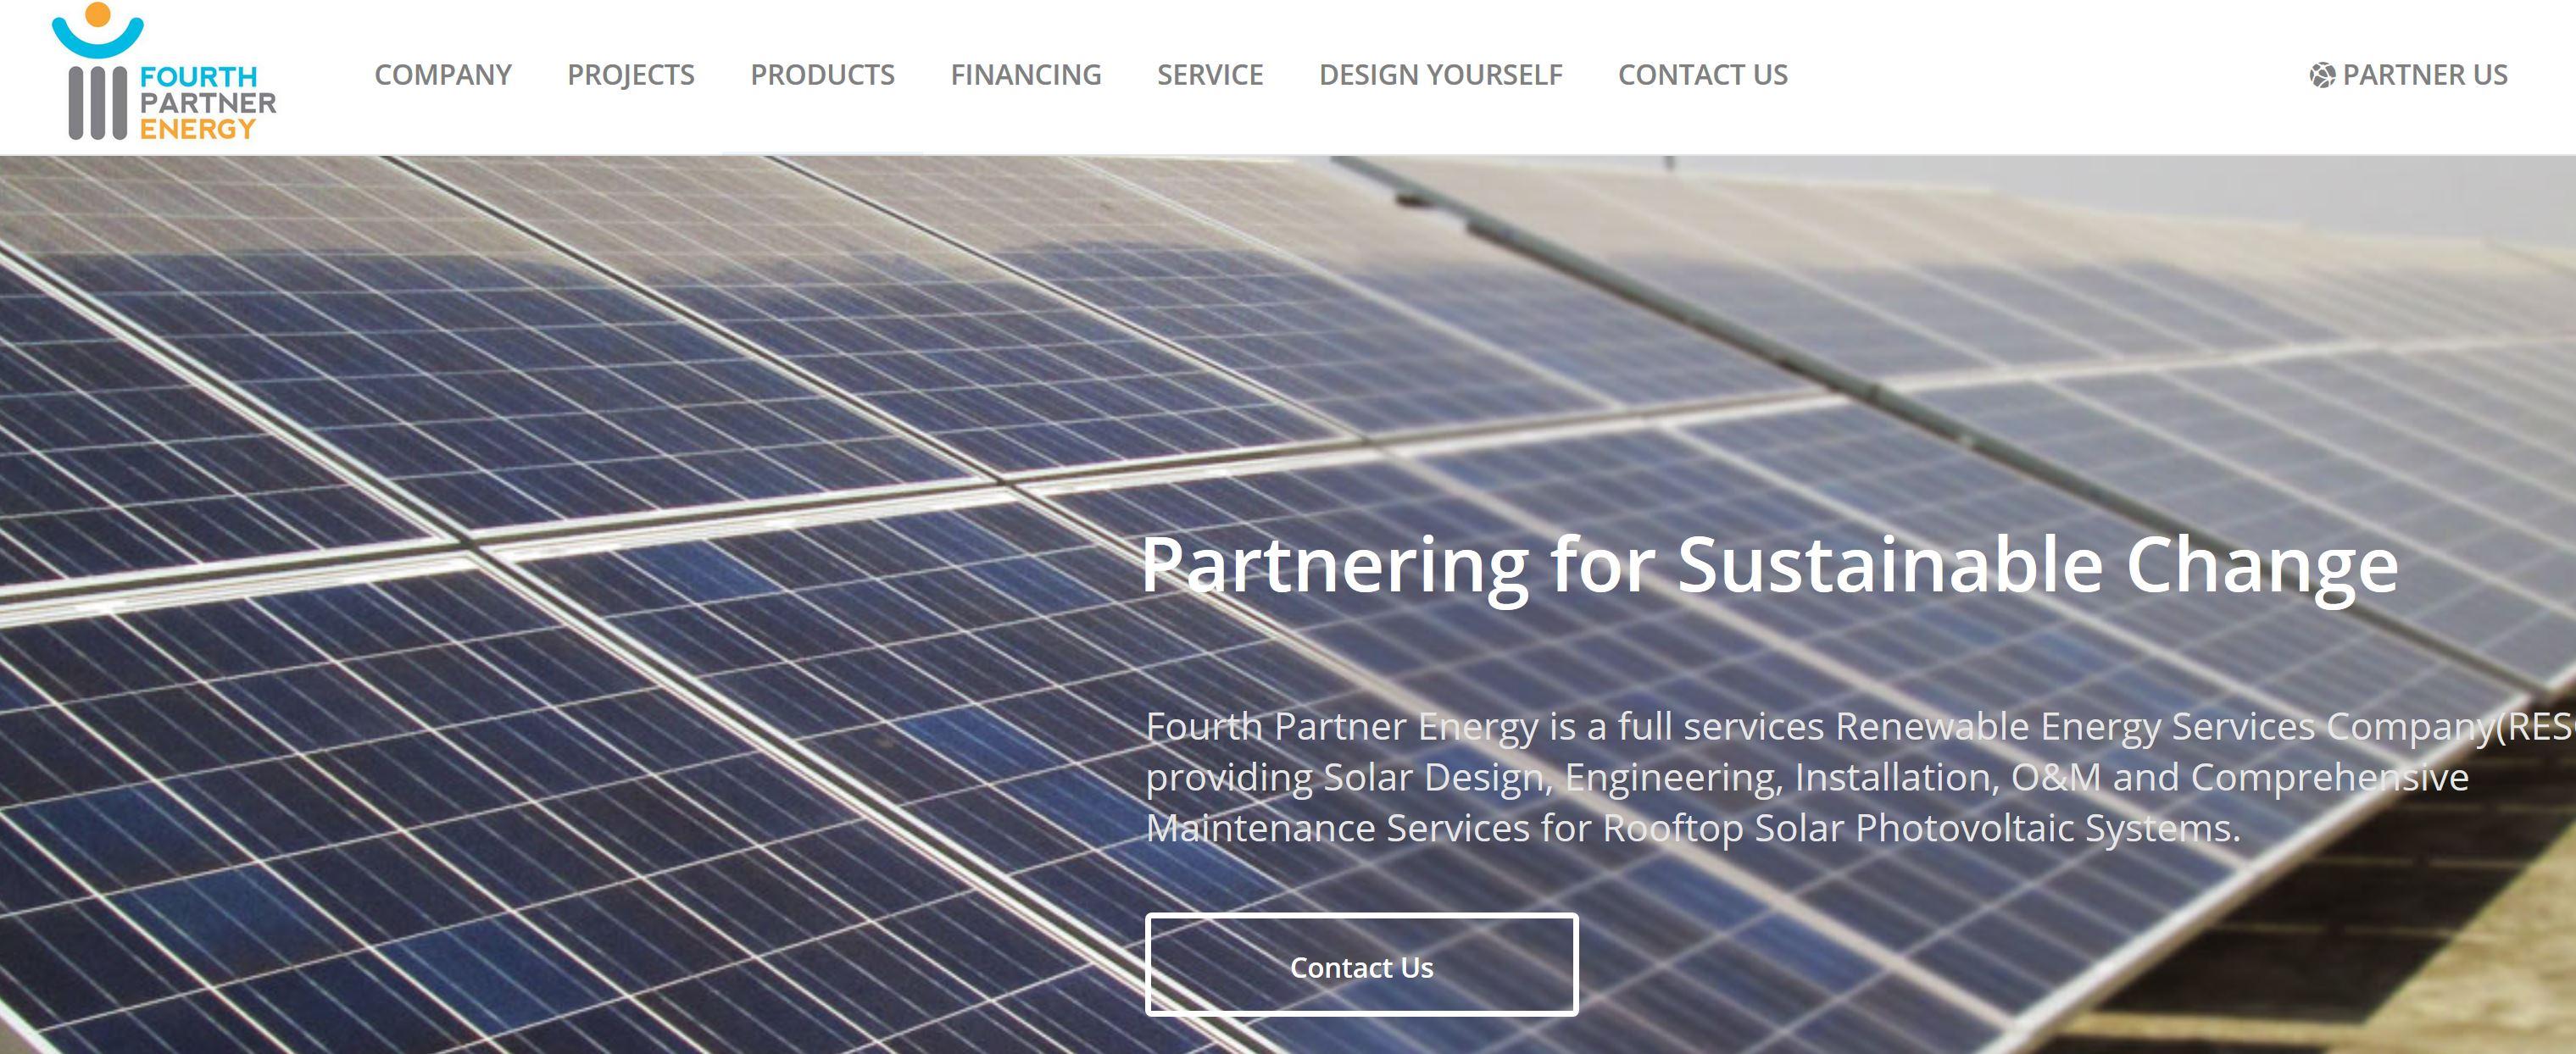 fourth-partner-energy